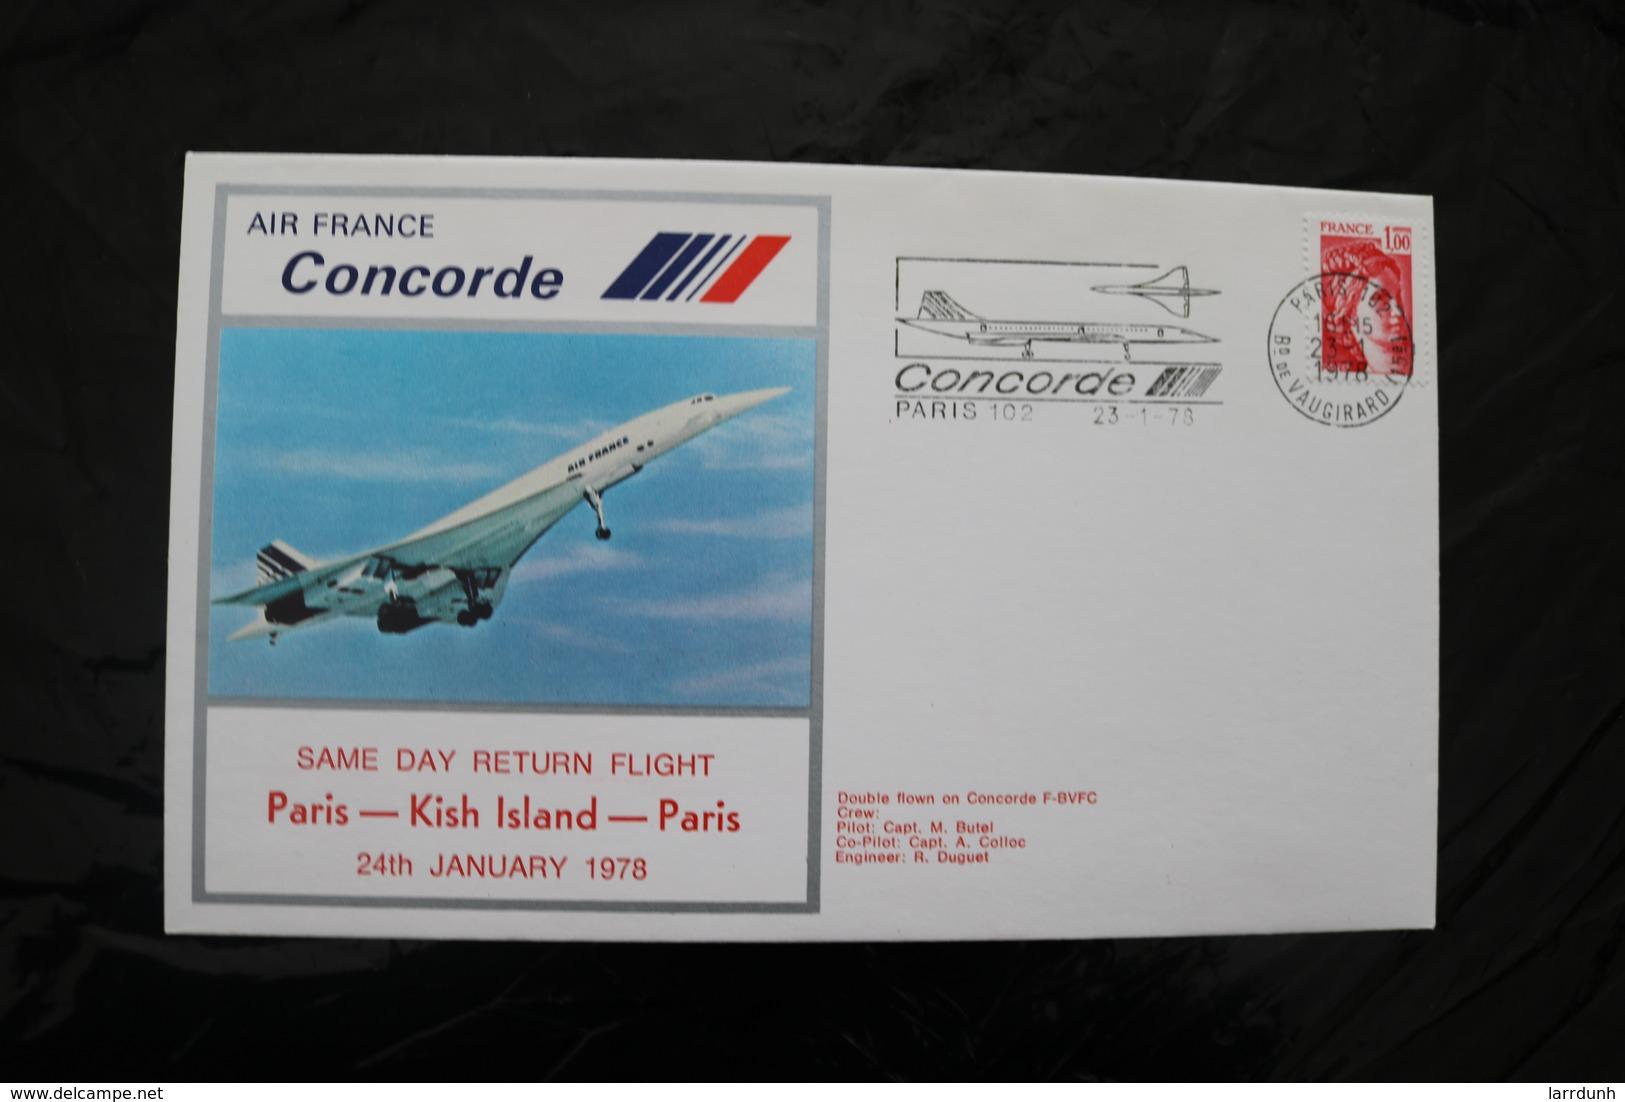 France  Same Day Return Flight Paris Kish Island Paris Concorde Special Cancel 1978  A04s - Concorde